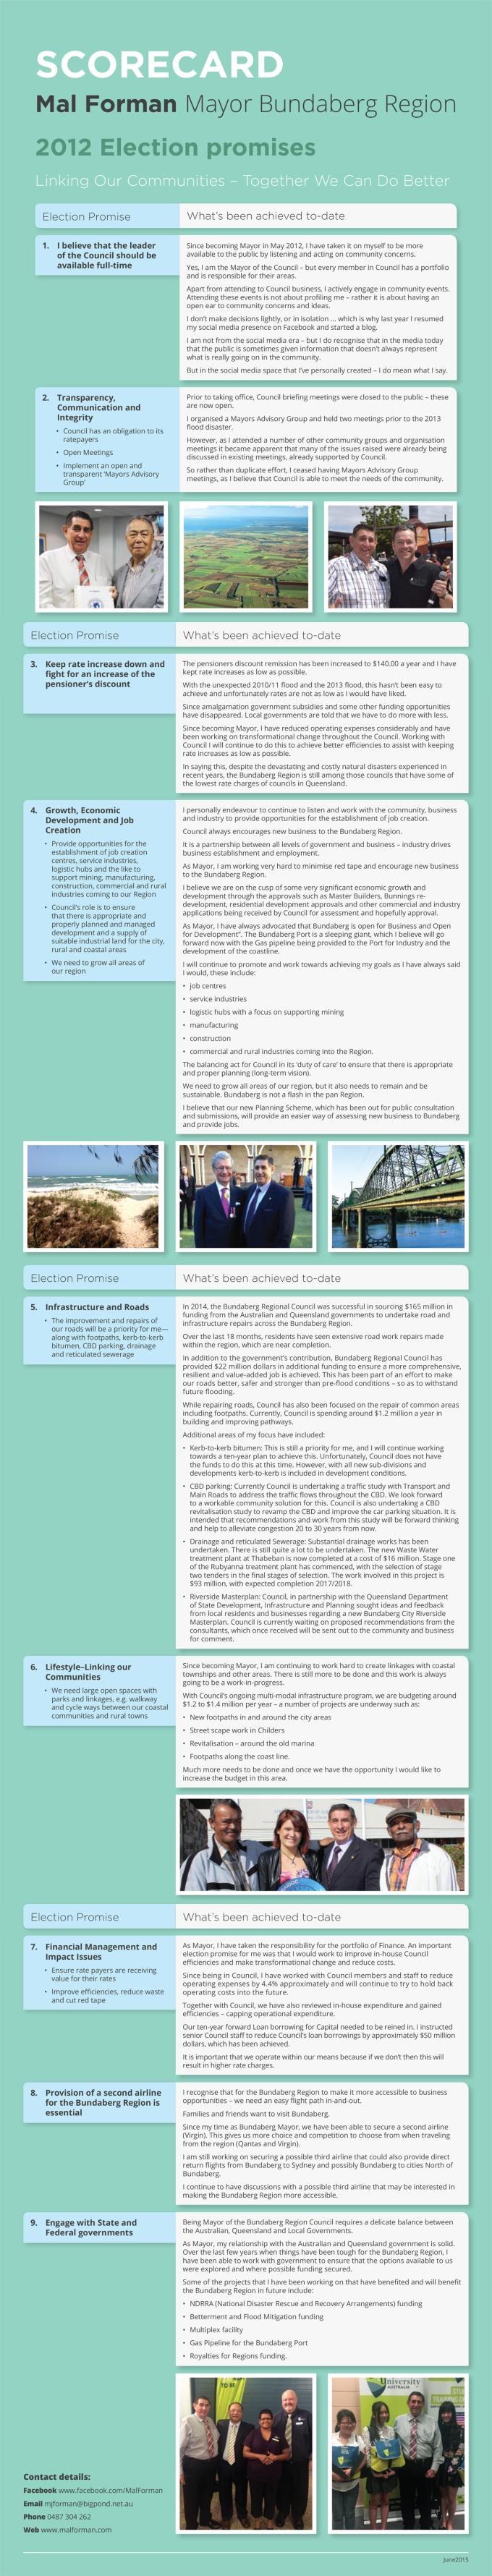 SCORECARD Mal Forman Mayor Bundaberg Region